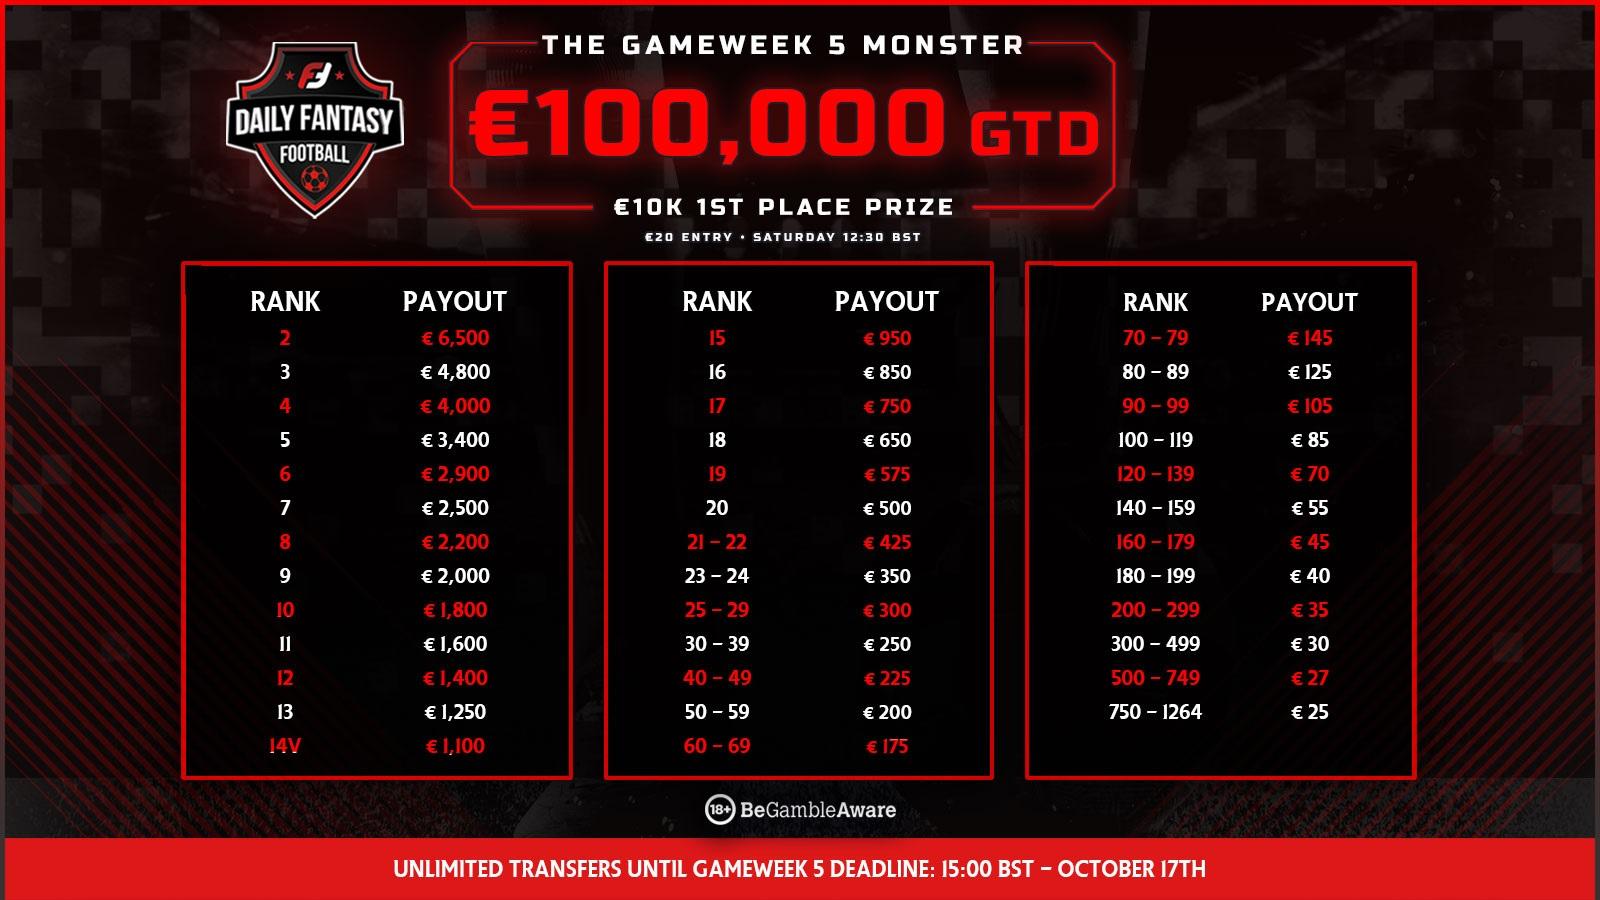 fanteam gameweek monster - gameweek 5 prize pool